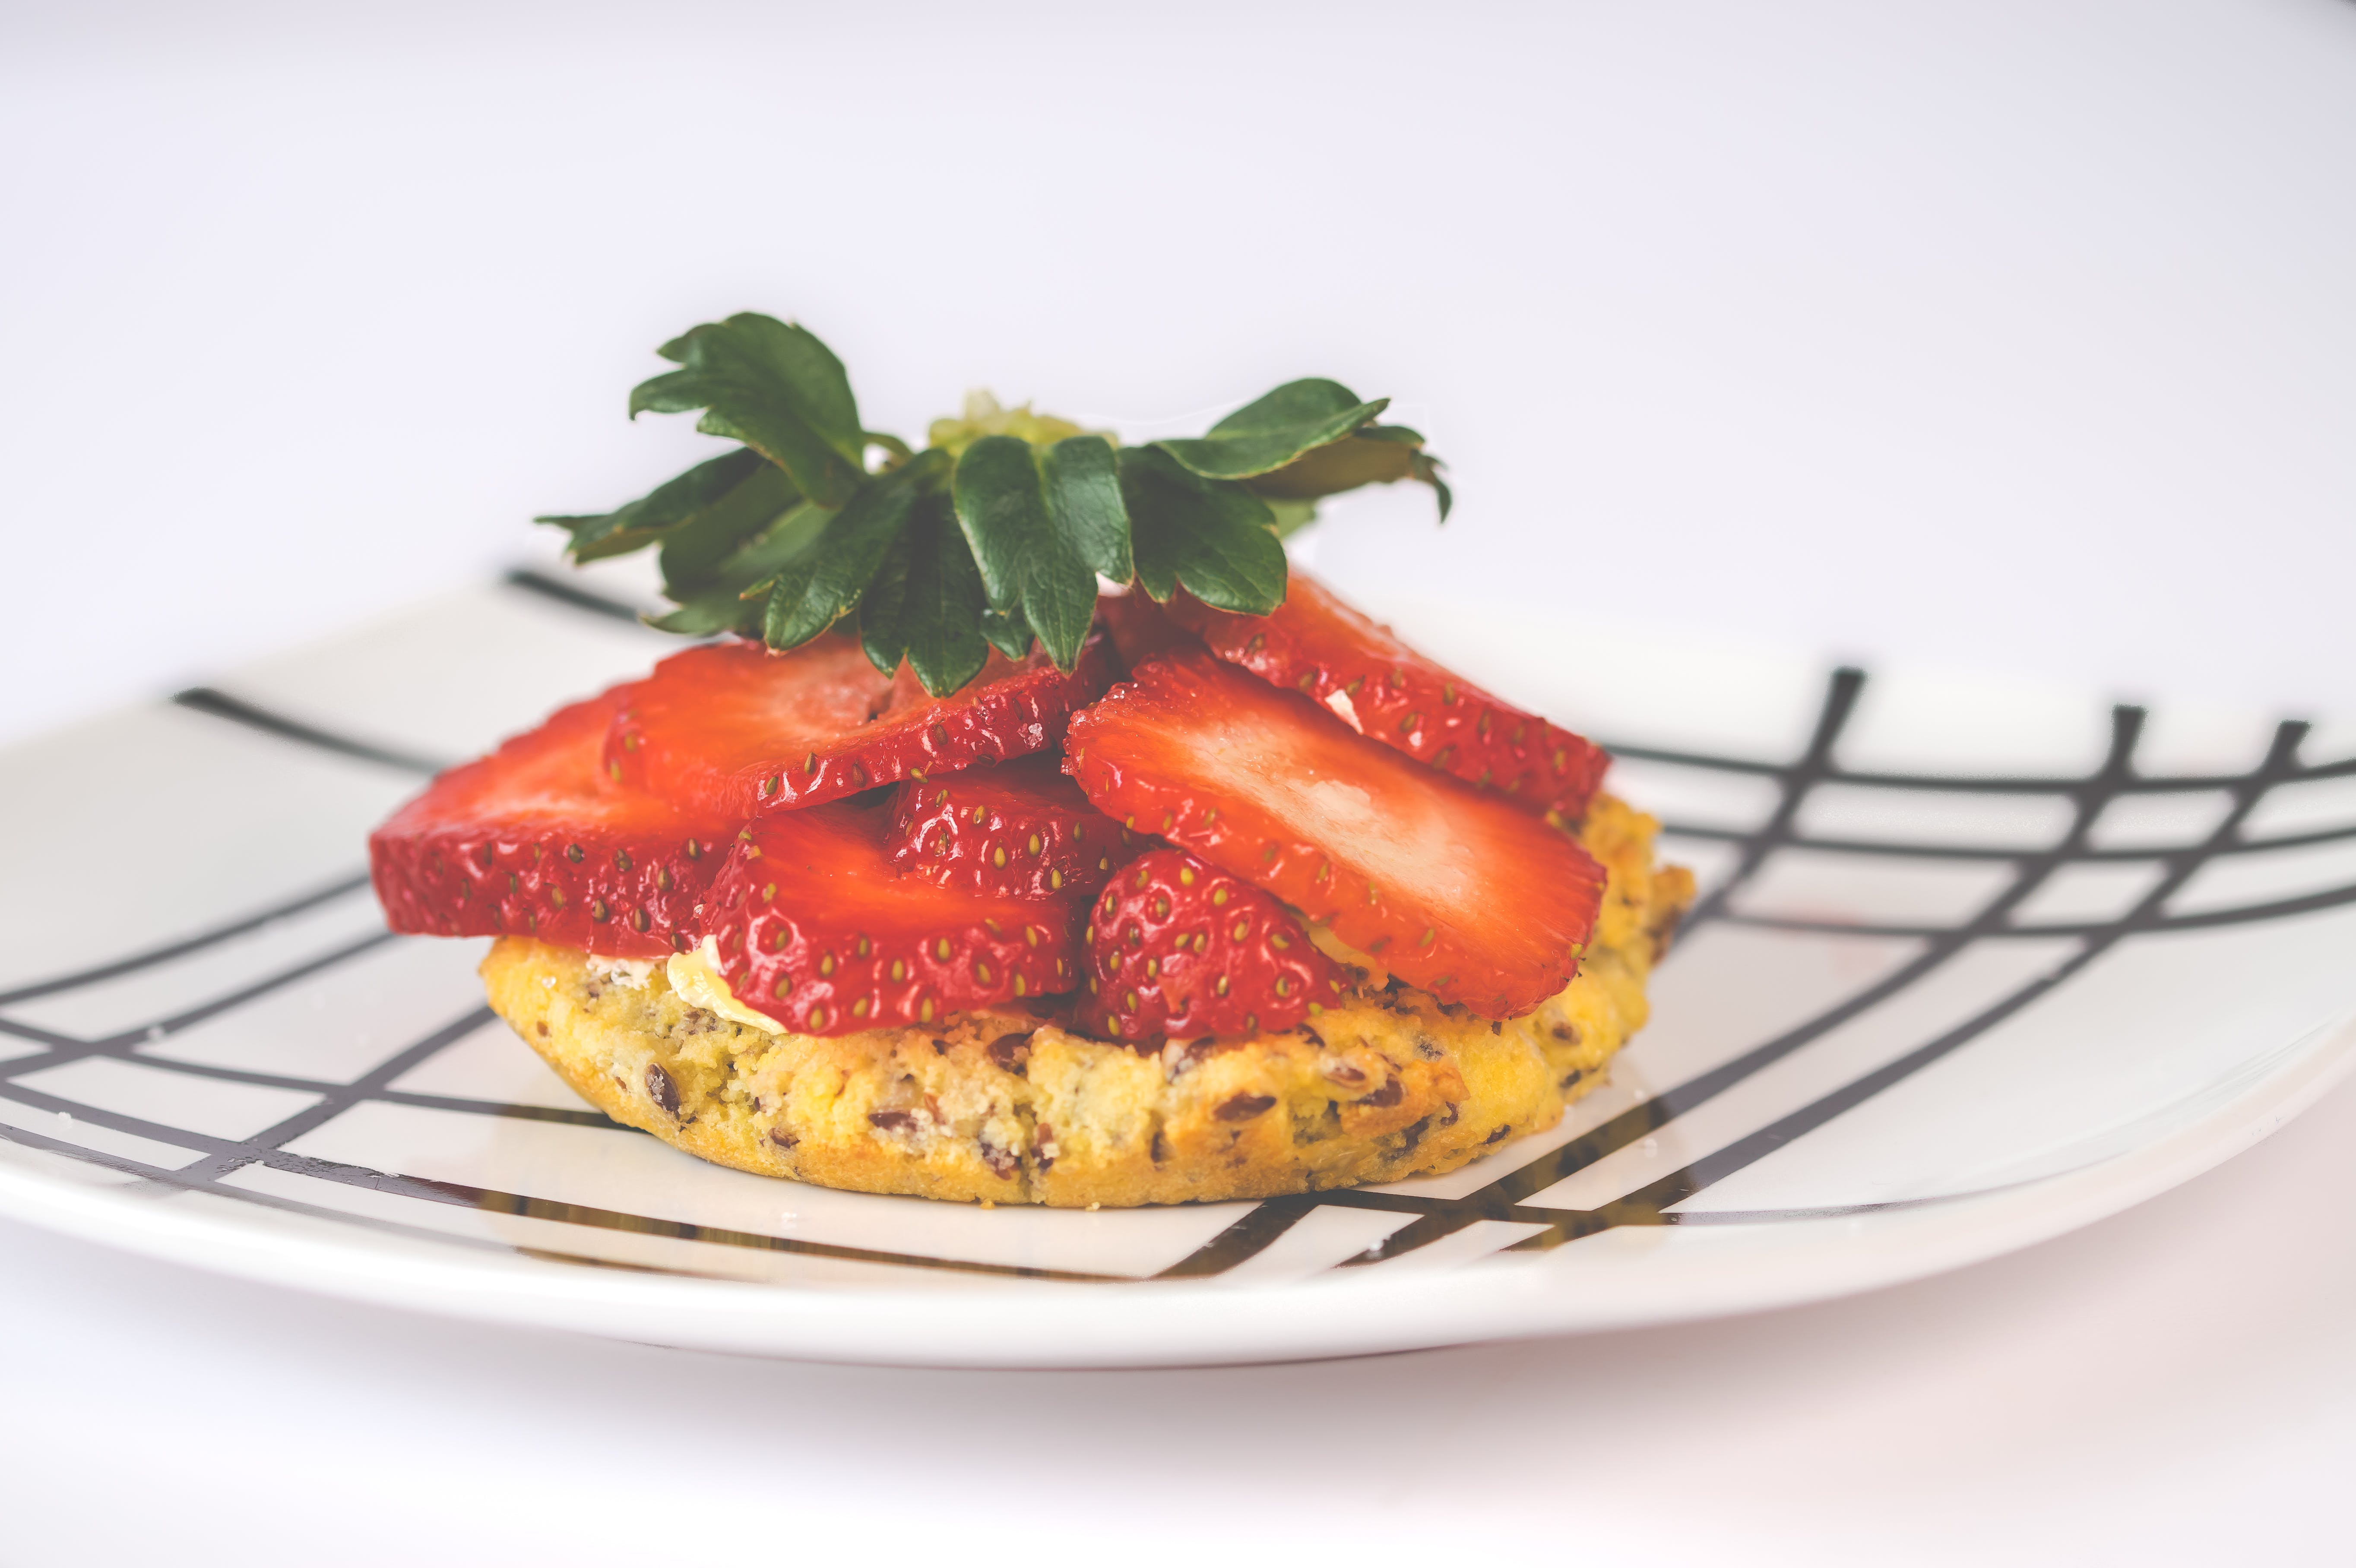 erdbeeren, essen, frisches obst